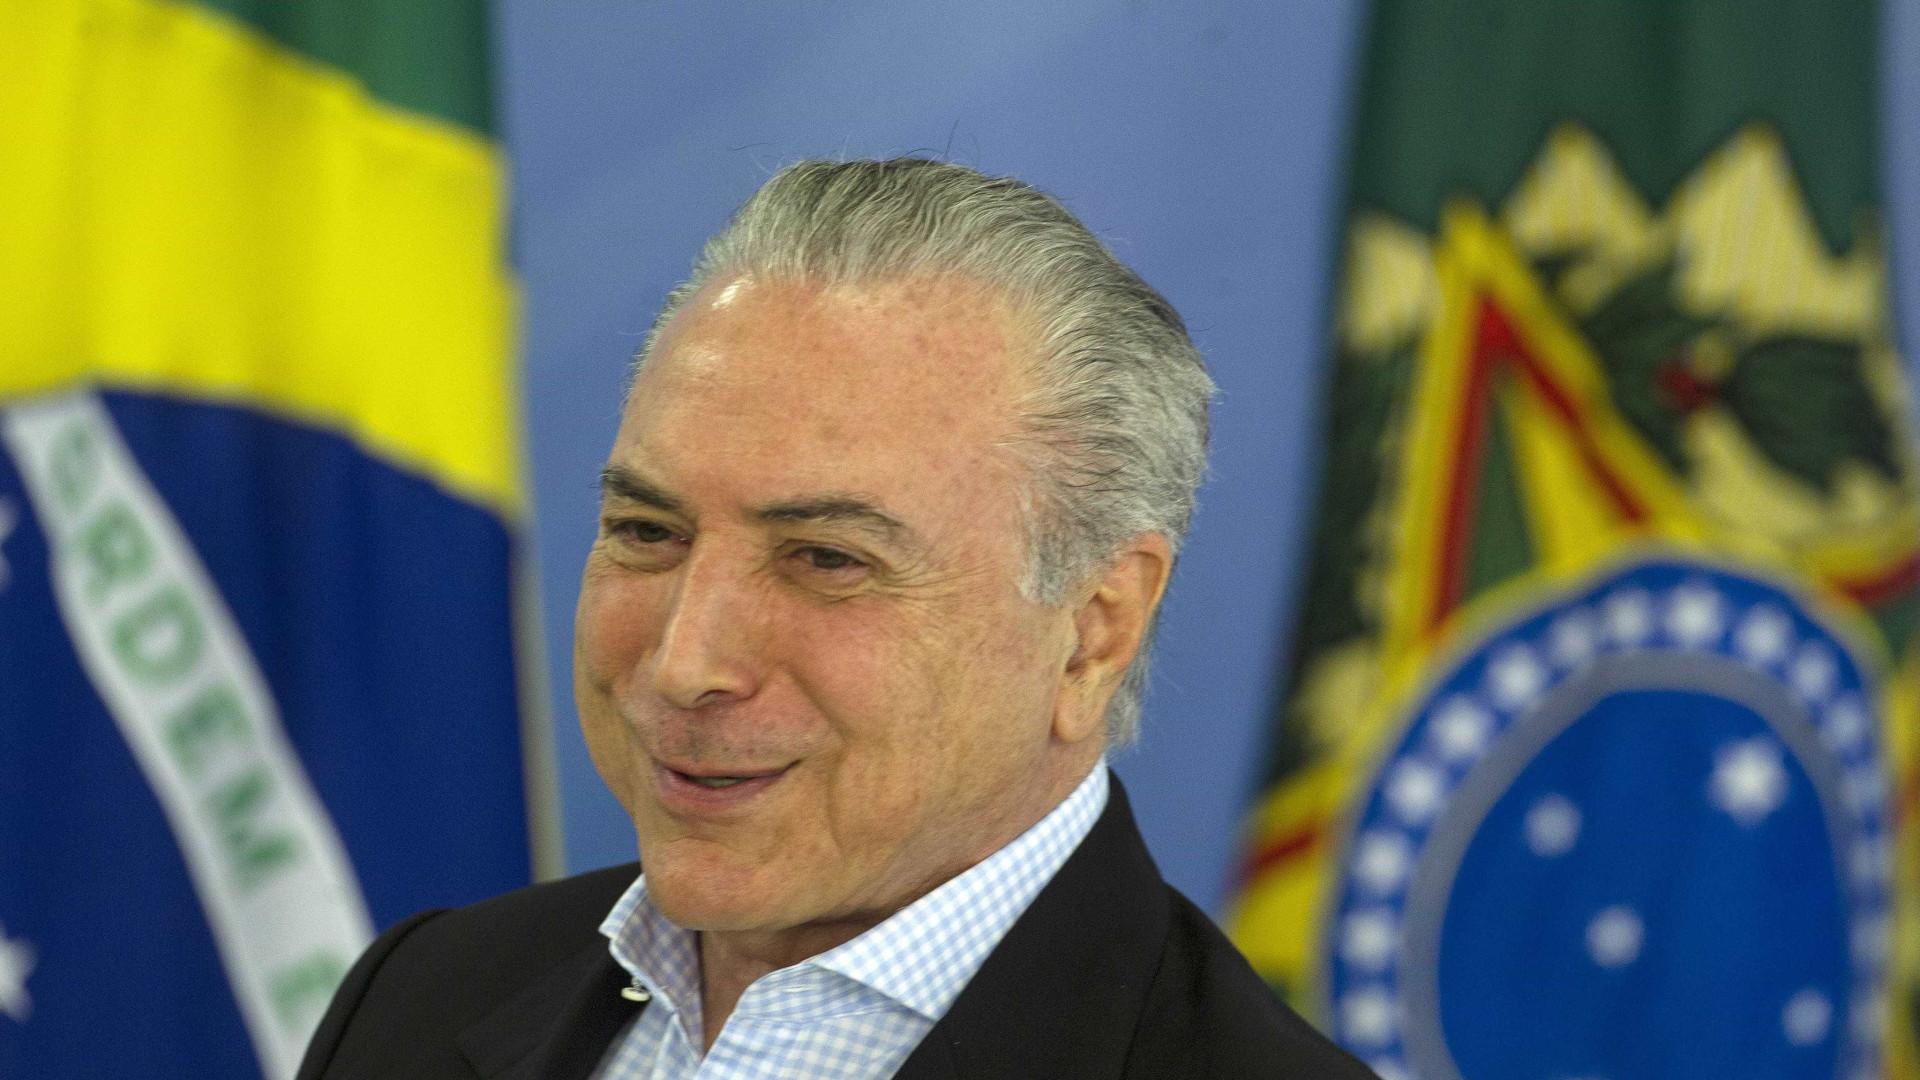 Brasil: PSOL apresenta pedido de 'impeachment' a Michel Temer